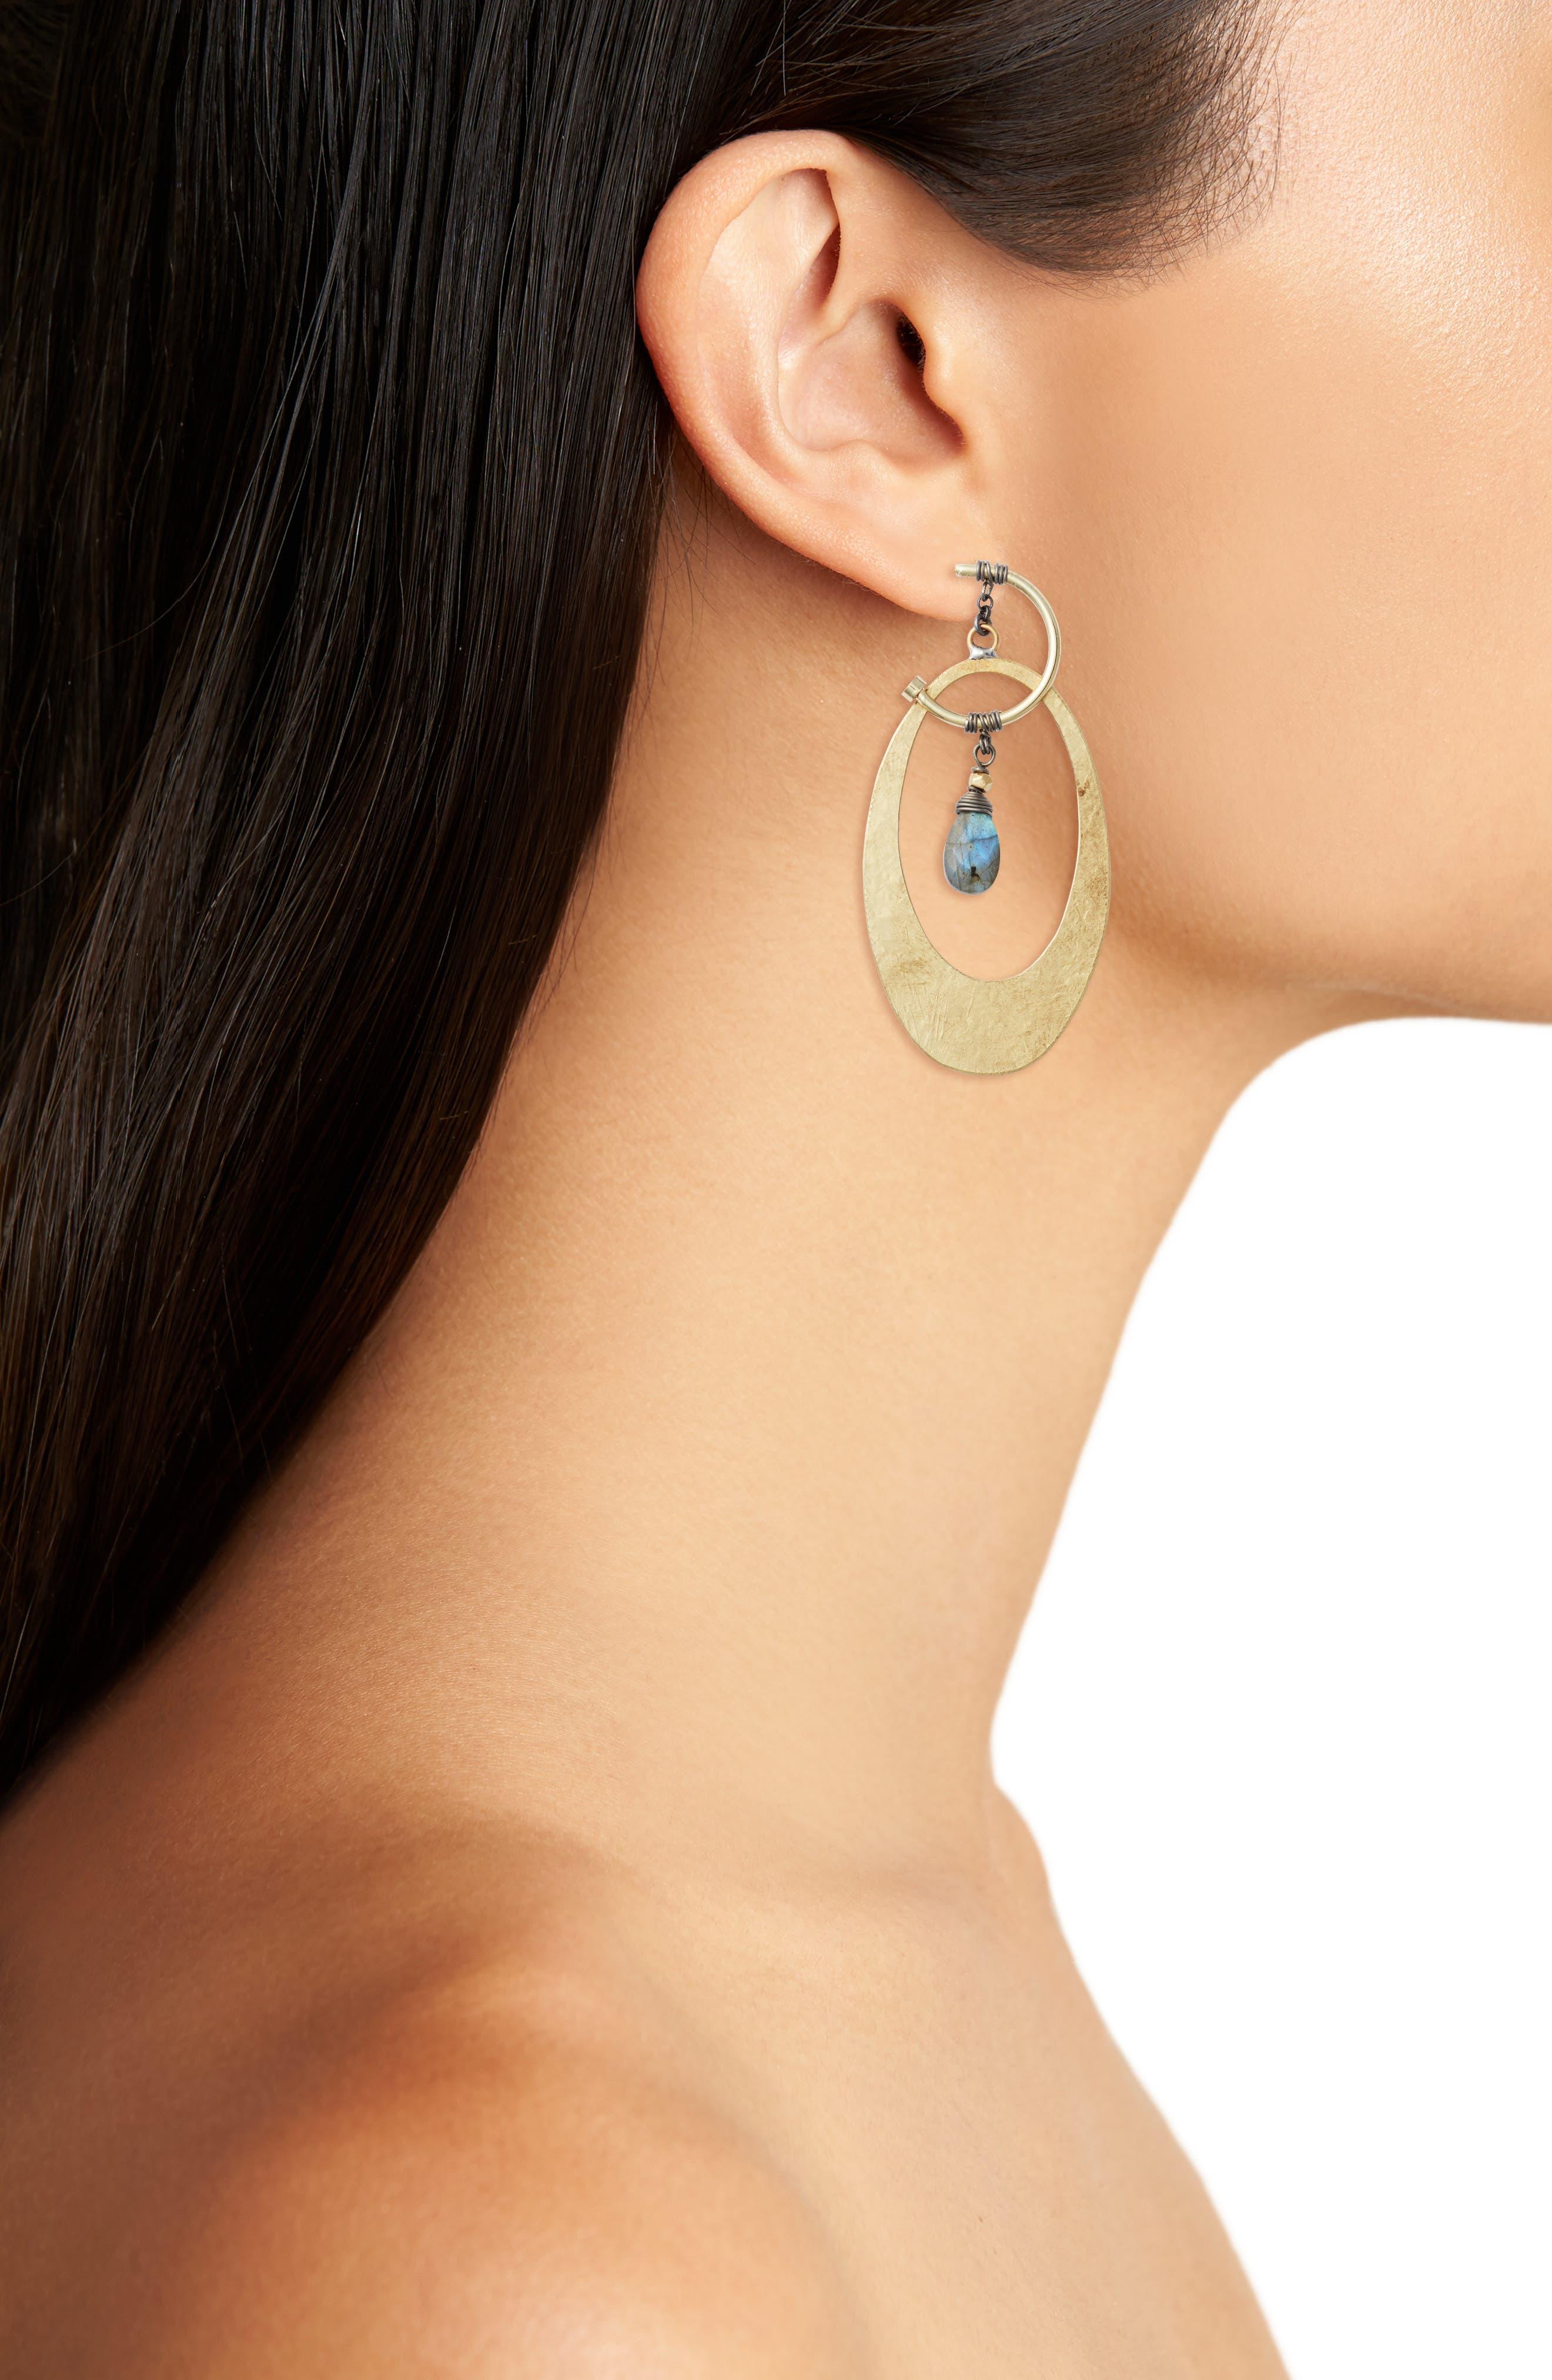 Oval Labradorite Earrings,                             Alternate thumbnail 2, color,